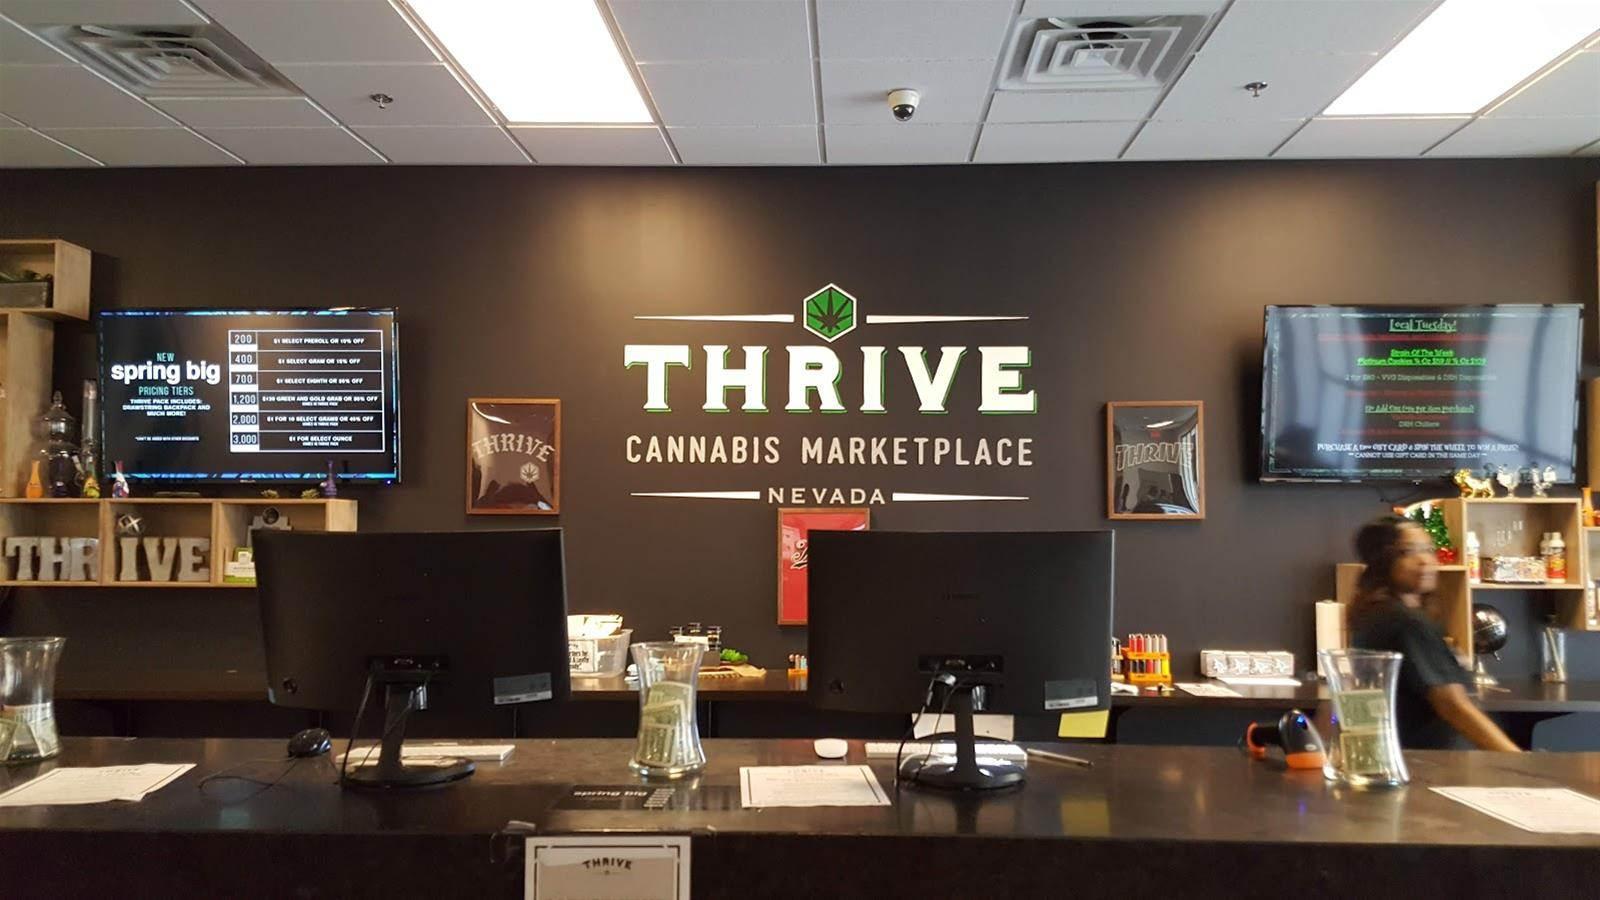 Thrive-Cannabis-Marketplace-North-Las-Vegas-7